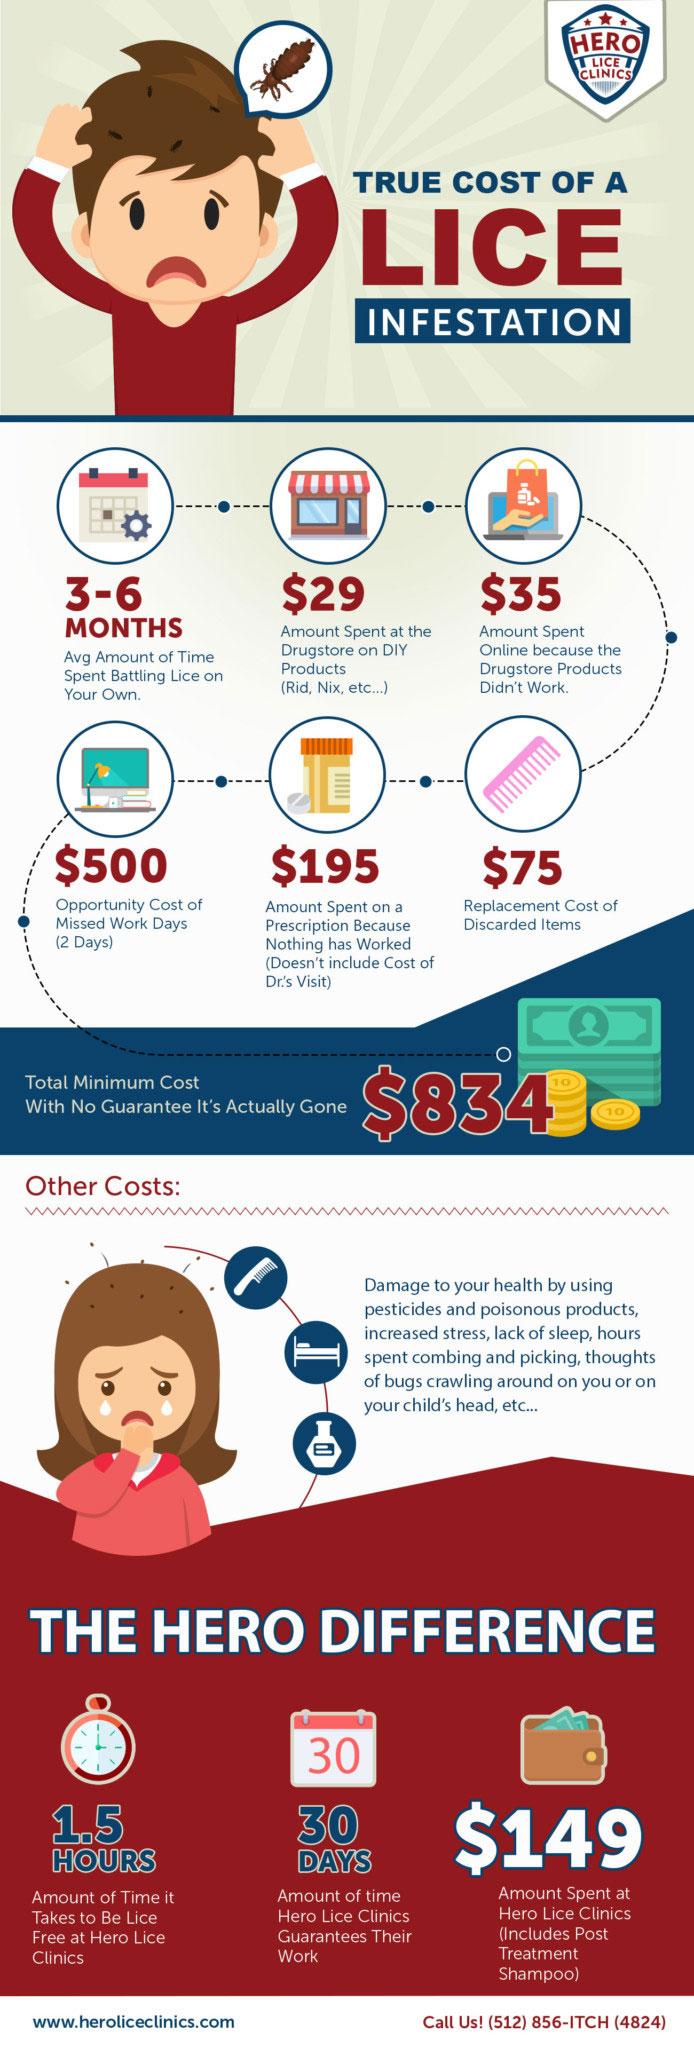 True Cost of Lice Infestation